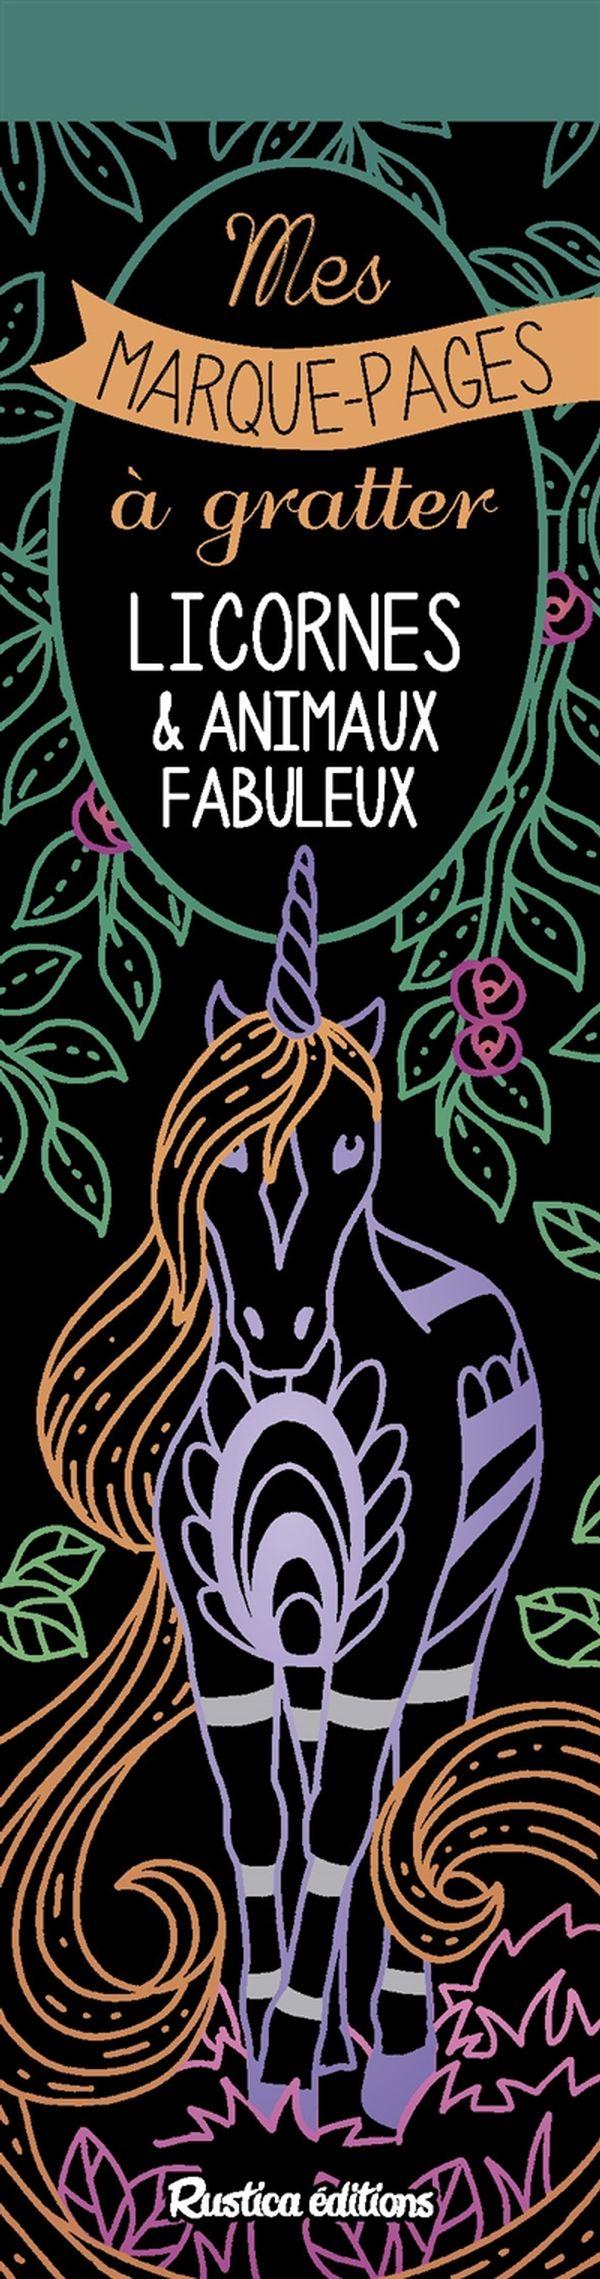 Licornes & animaux fabuleux N.E.